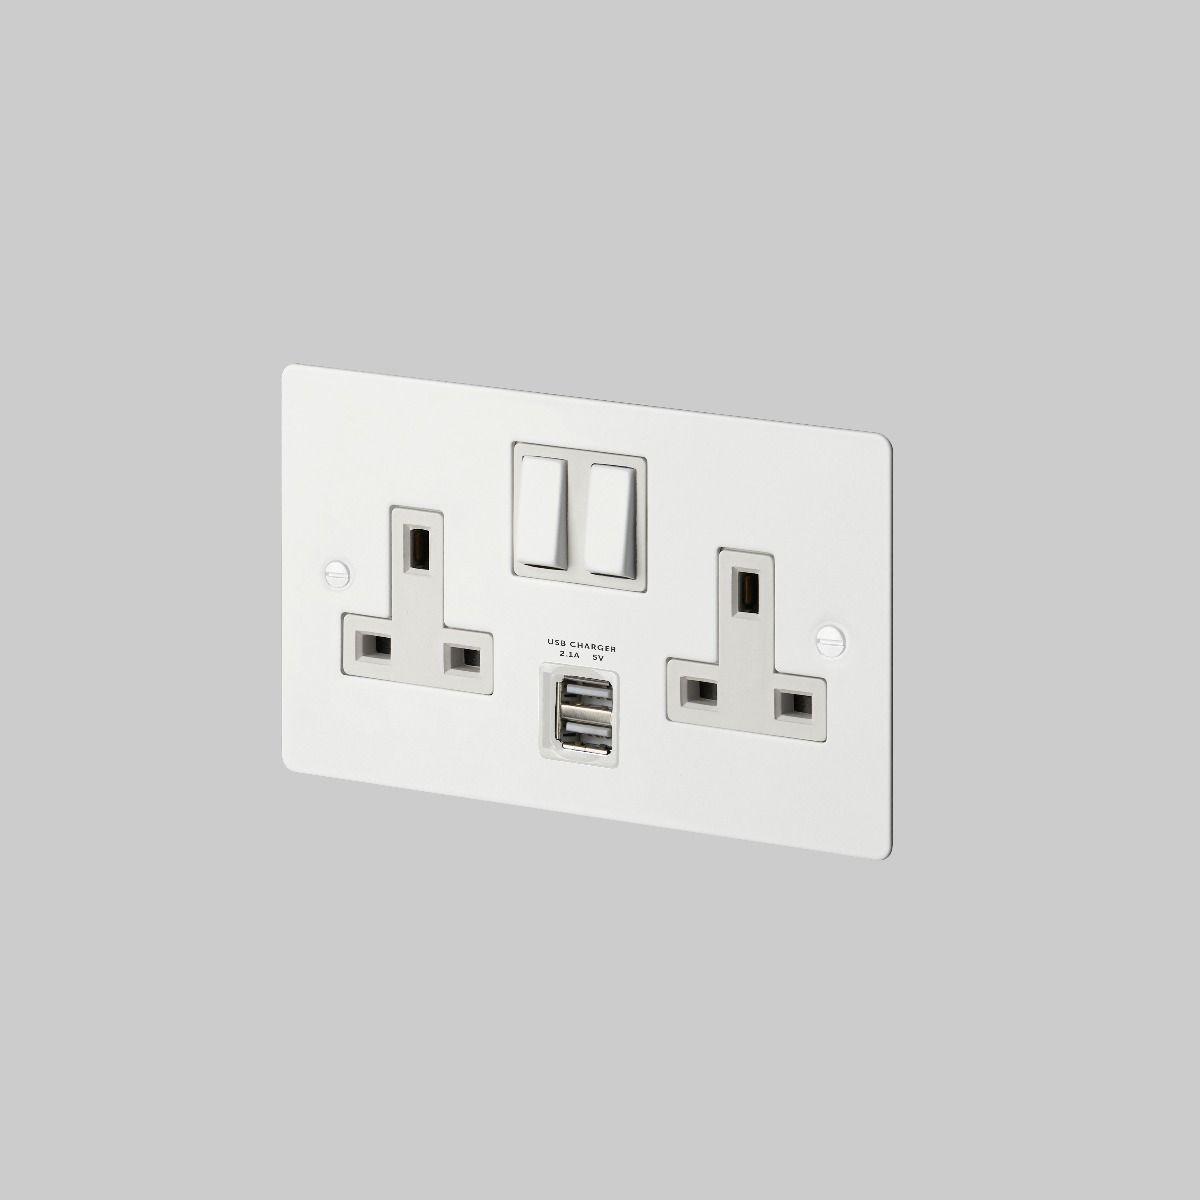 Buster + Punch UK Plug Socket 2G USB